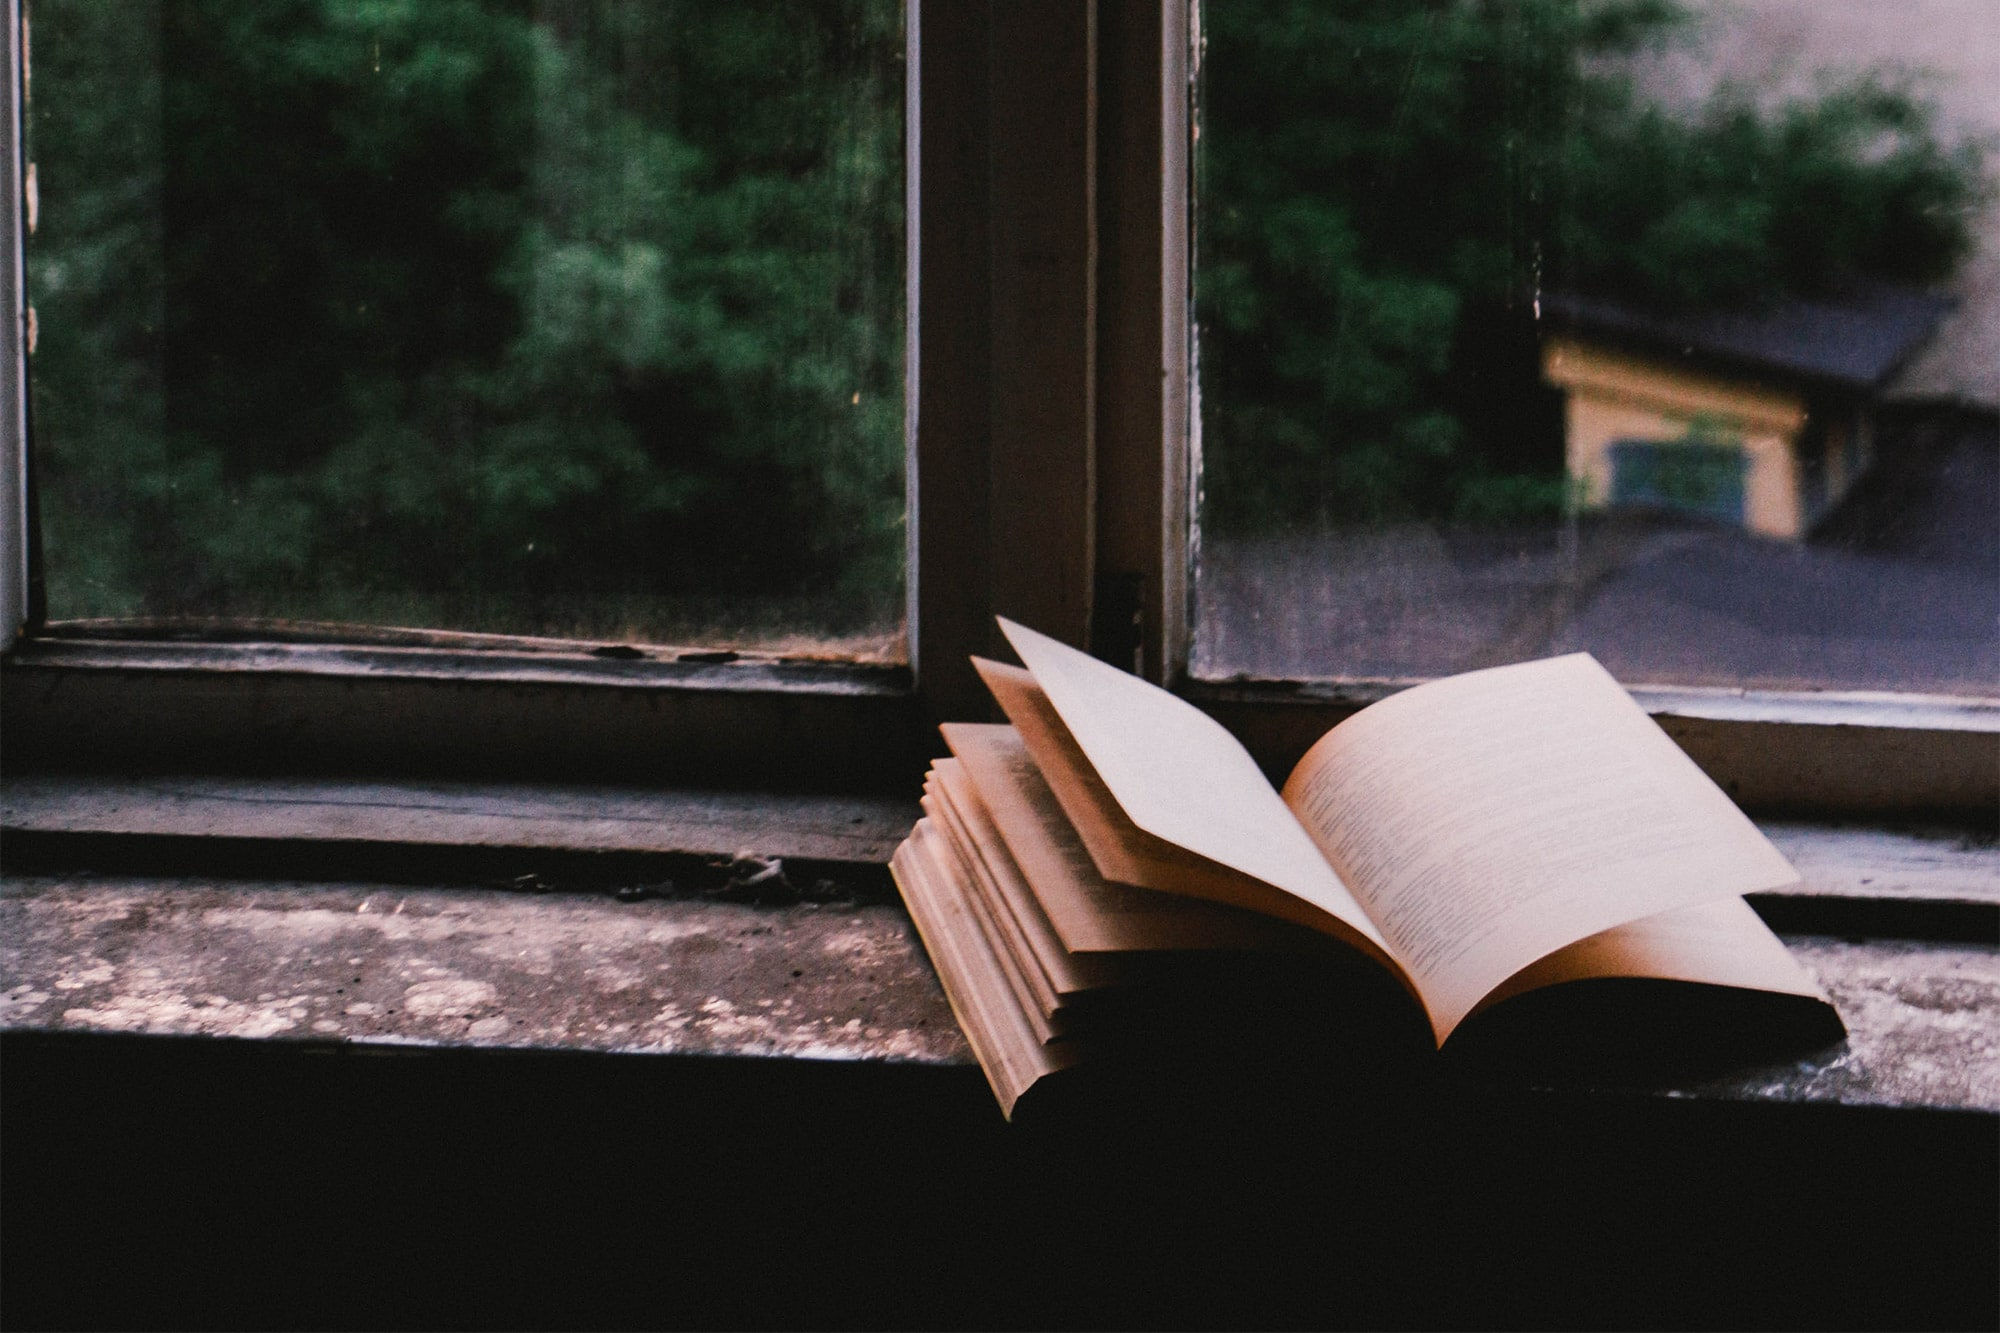 Aspiring Authors - Stop Aspiring blog title overlay